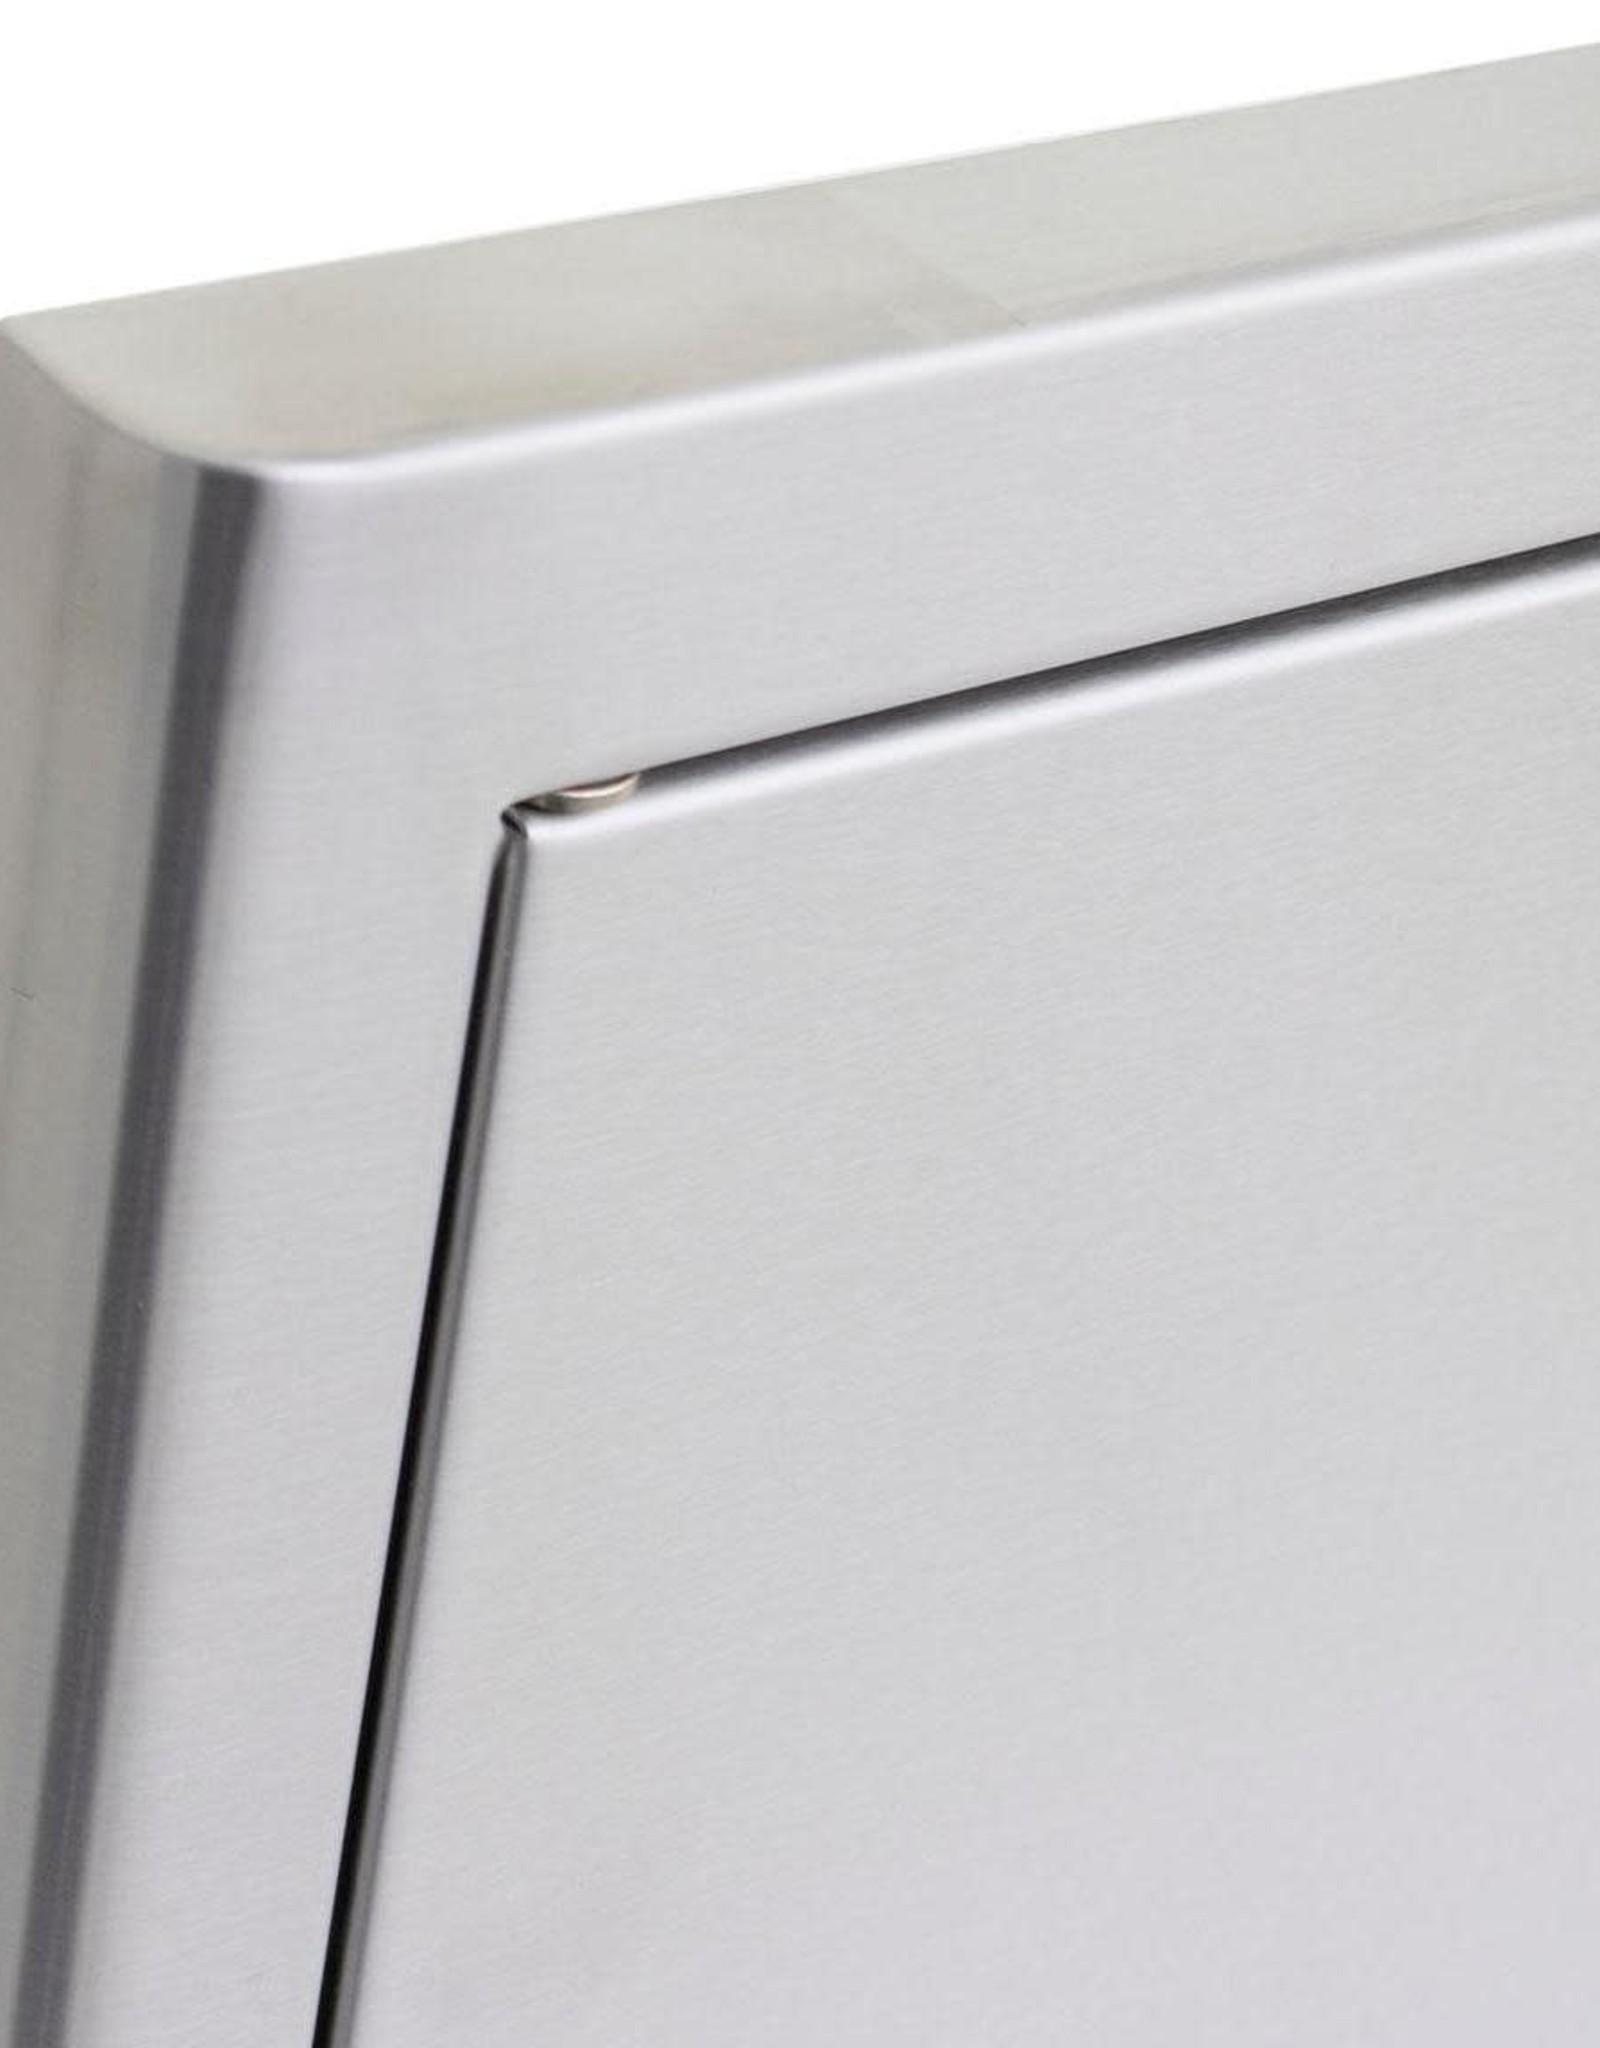 Blaze Outdoor Products Blaze 39-Inch Stainless Steel Access Door & Triple Drawer Combo - BLZ-DDC-39-R